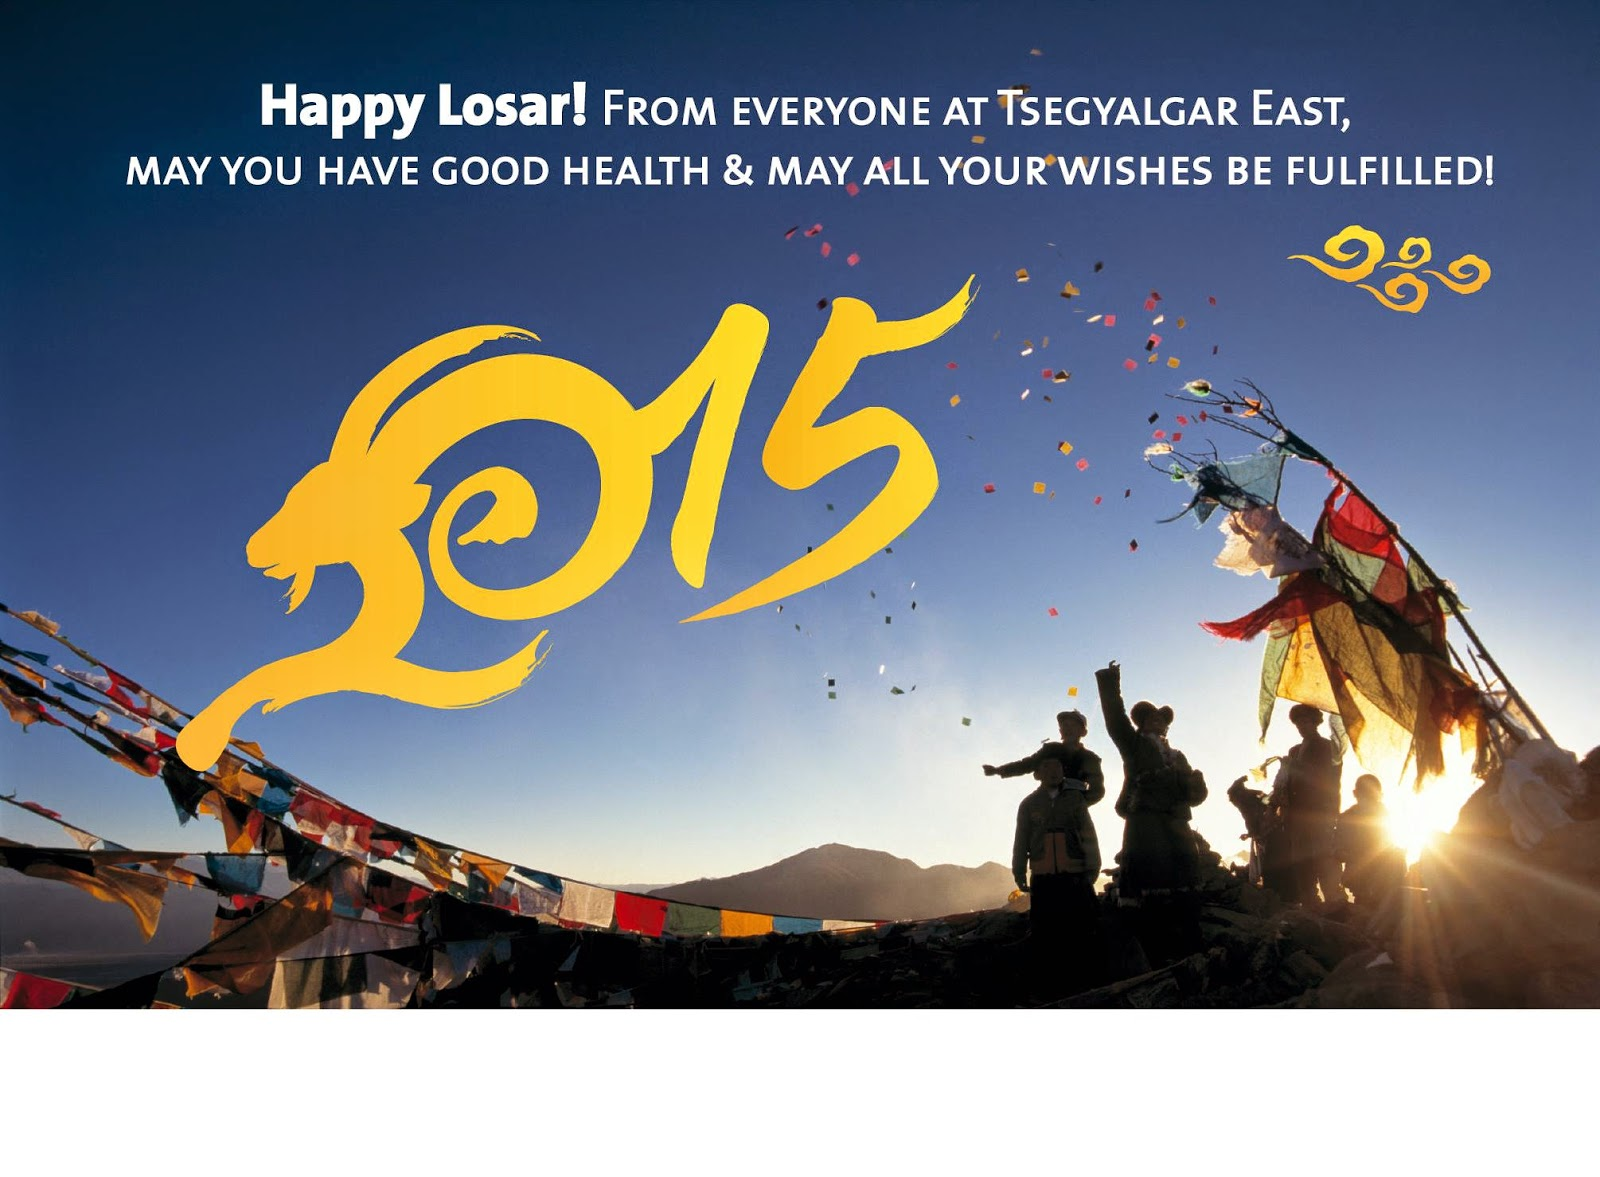 Tsegyalgar east community blog february 2015 more losar greetings from tsegyalgar east m4hsunfo